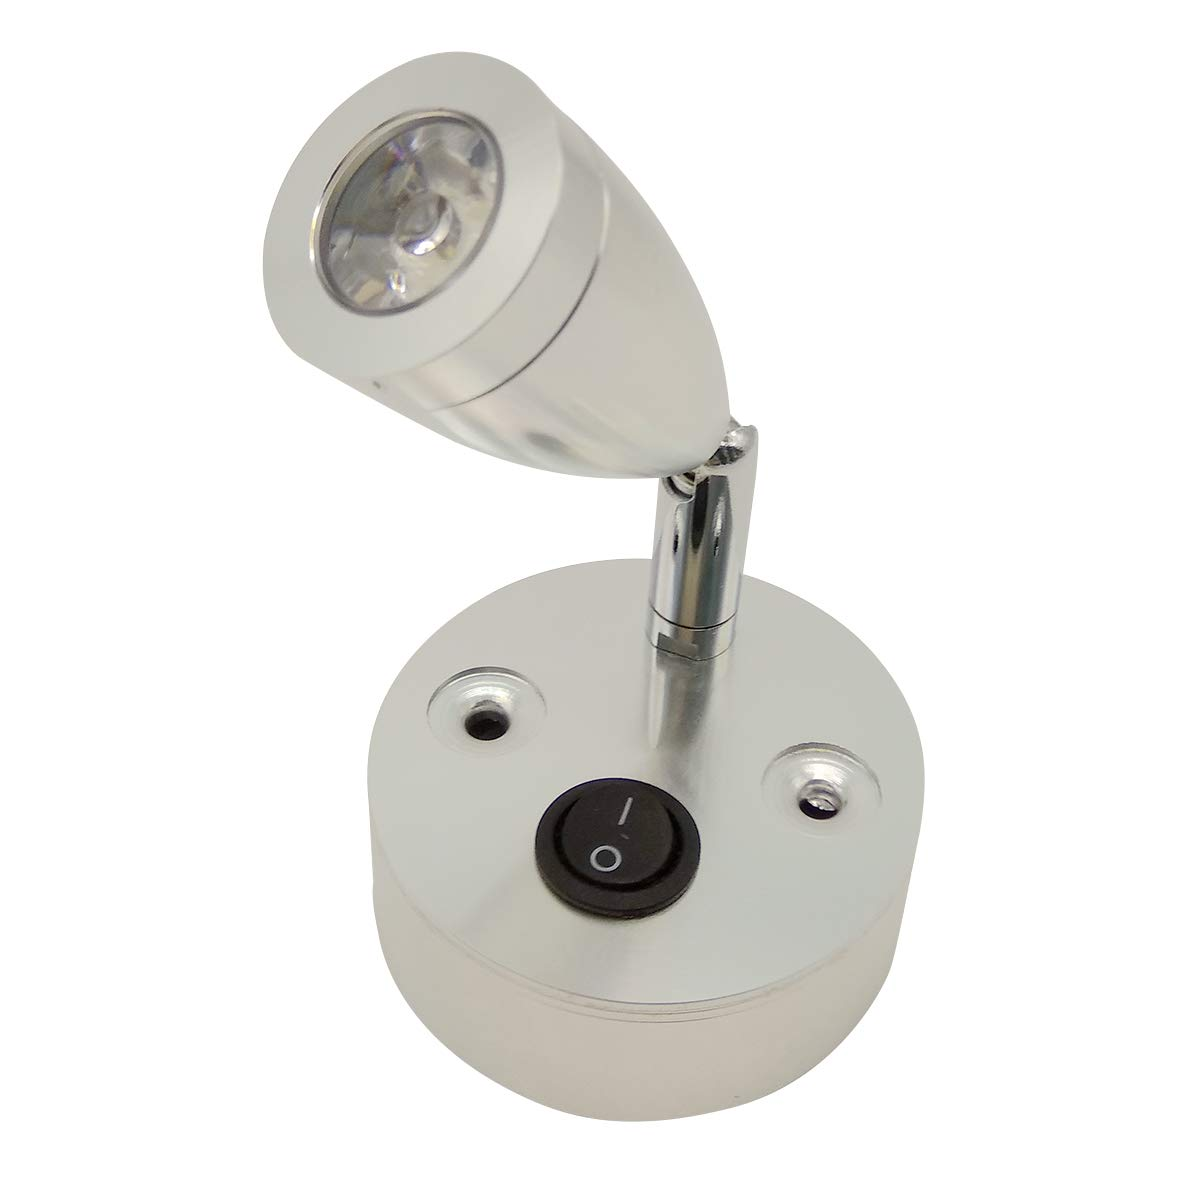 Vosarea LED Reading Lights with Brushed Nickel Lampshade Warm Lighting 2 Pcs 3000K 3W 24V